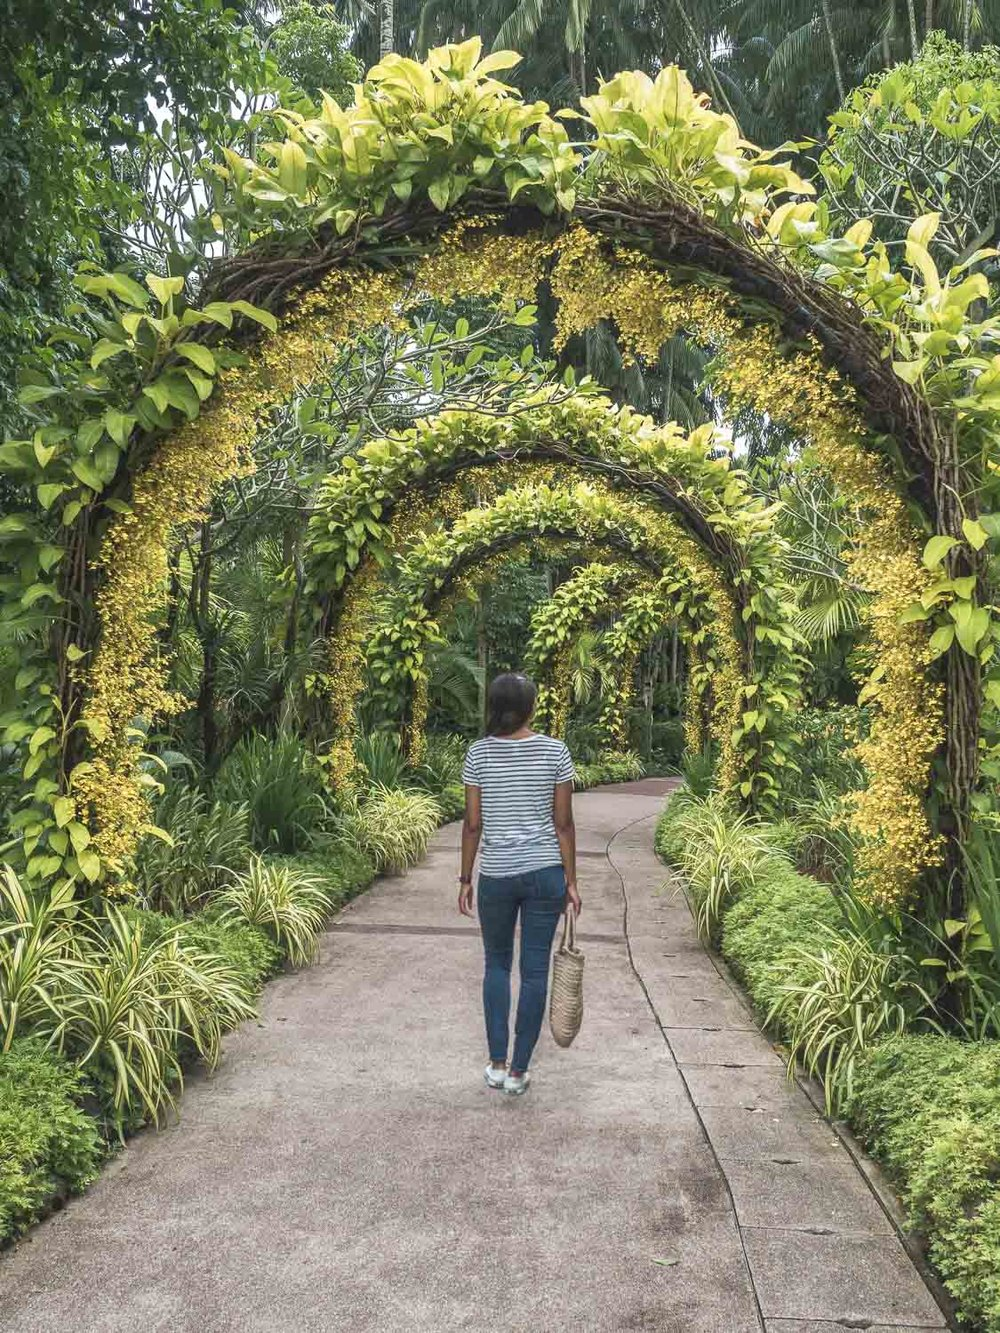 Jardim-Botanico-Singapura.jpg